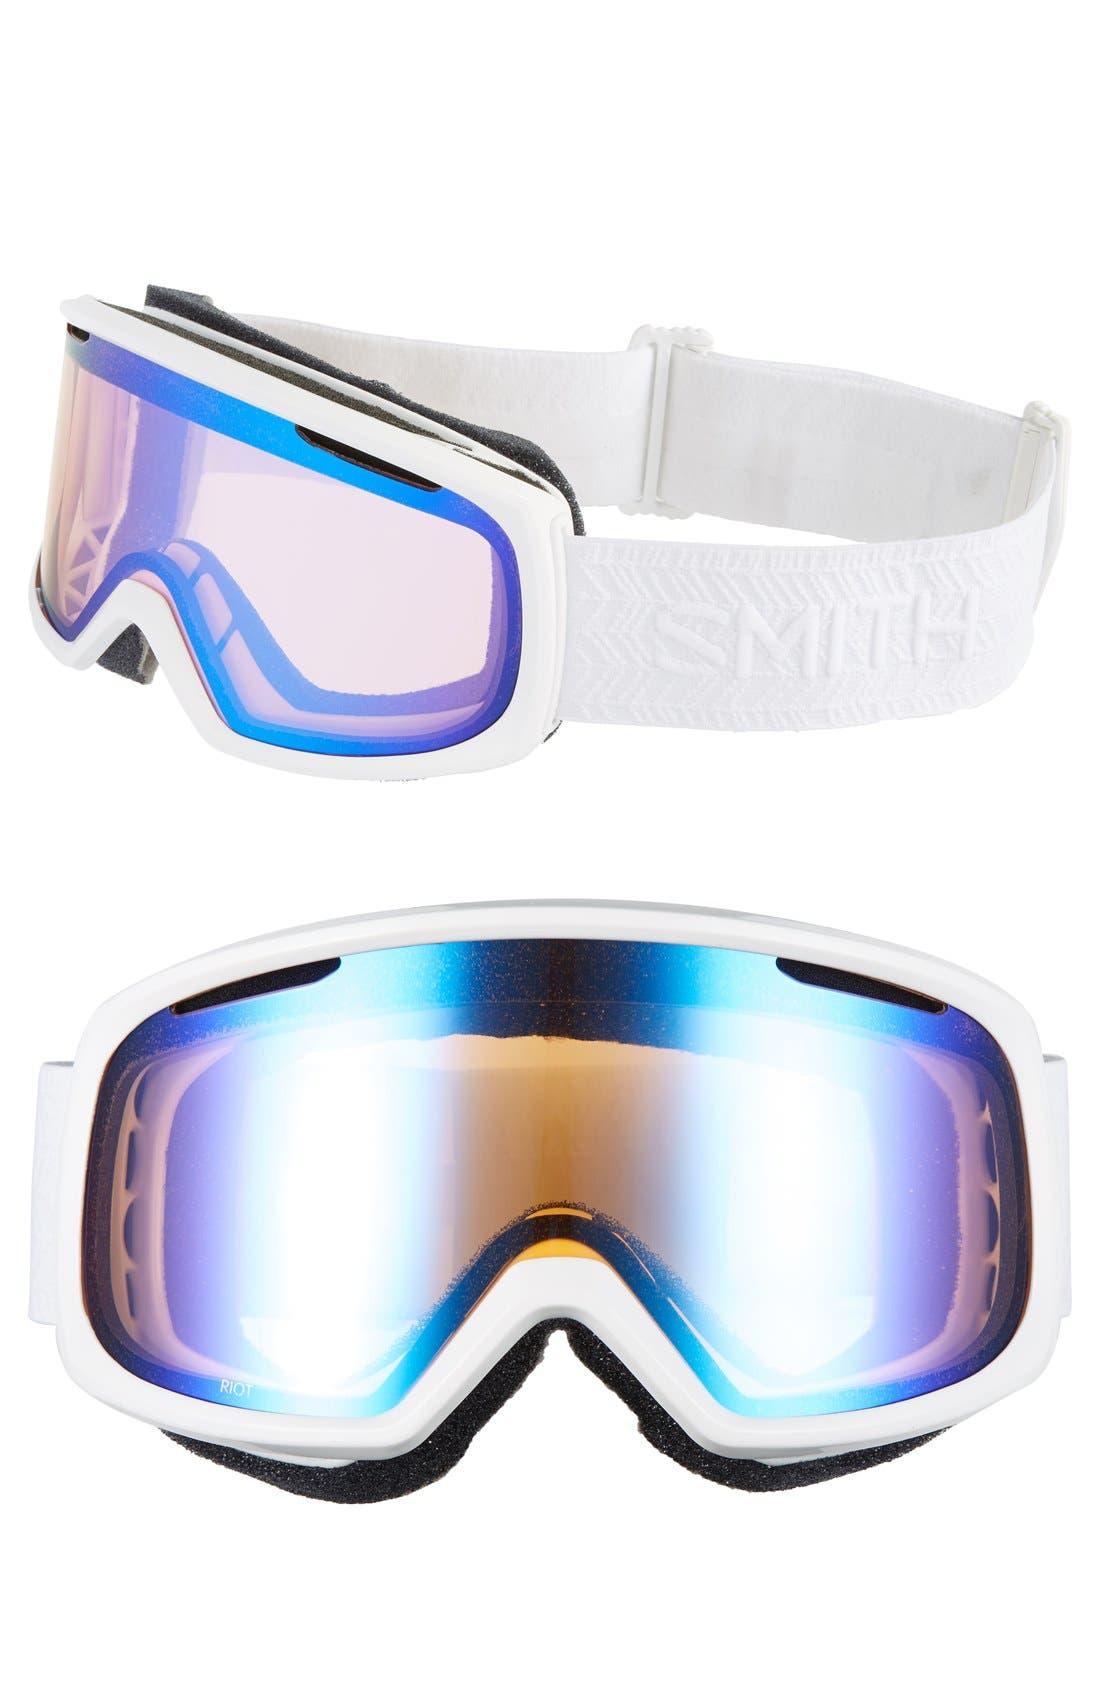 'Riot' Snow Goggles,                             Main thumbnail 1, color,                             White Eclipse/ Blue Mirror